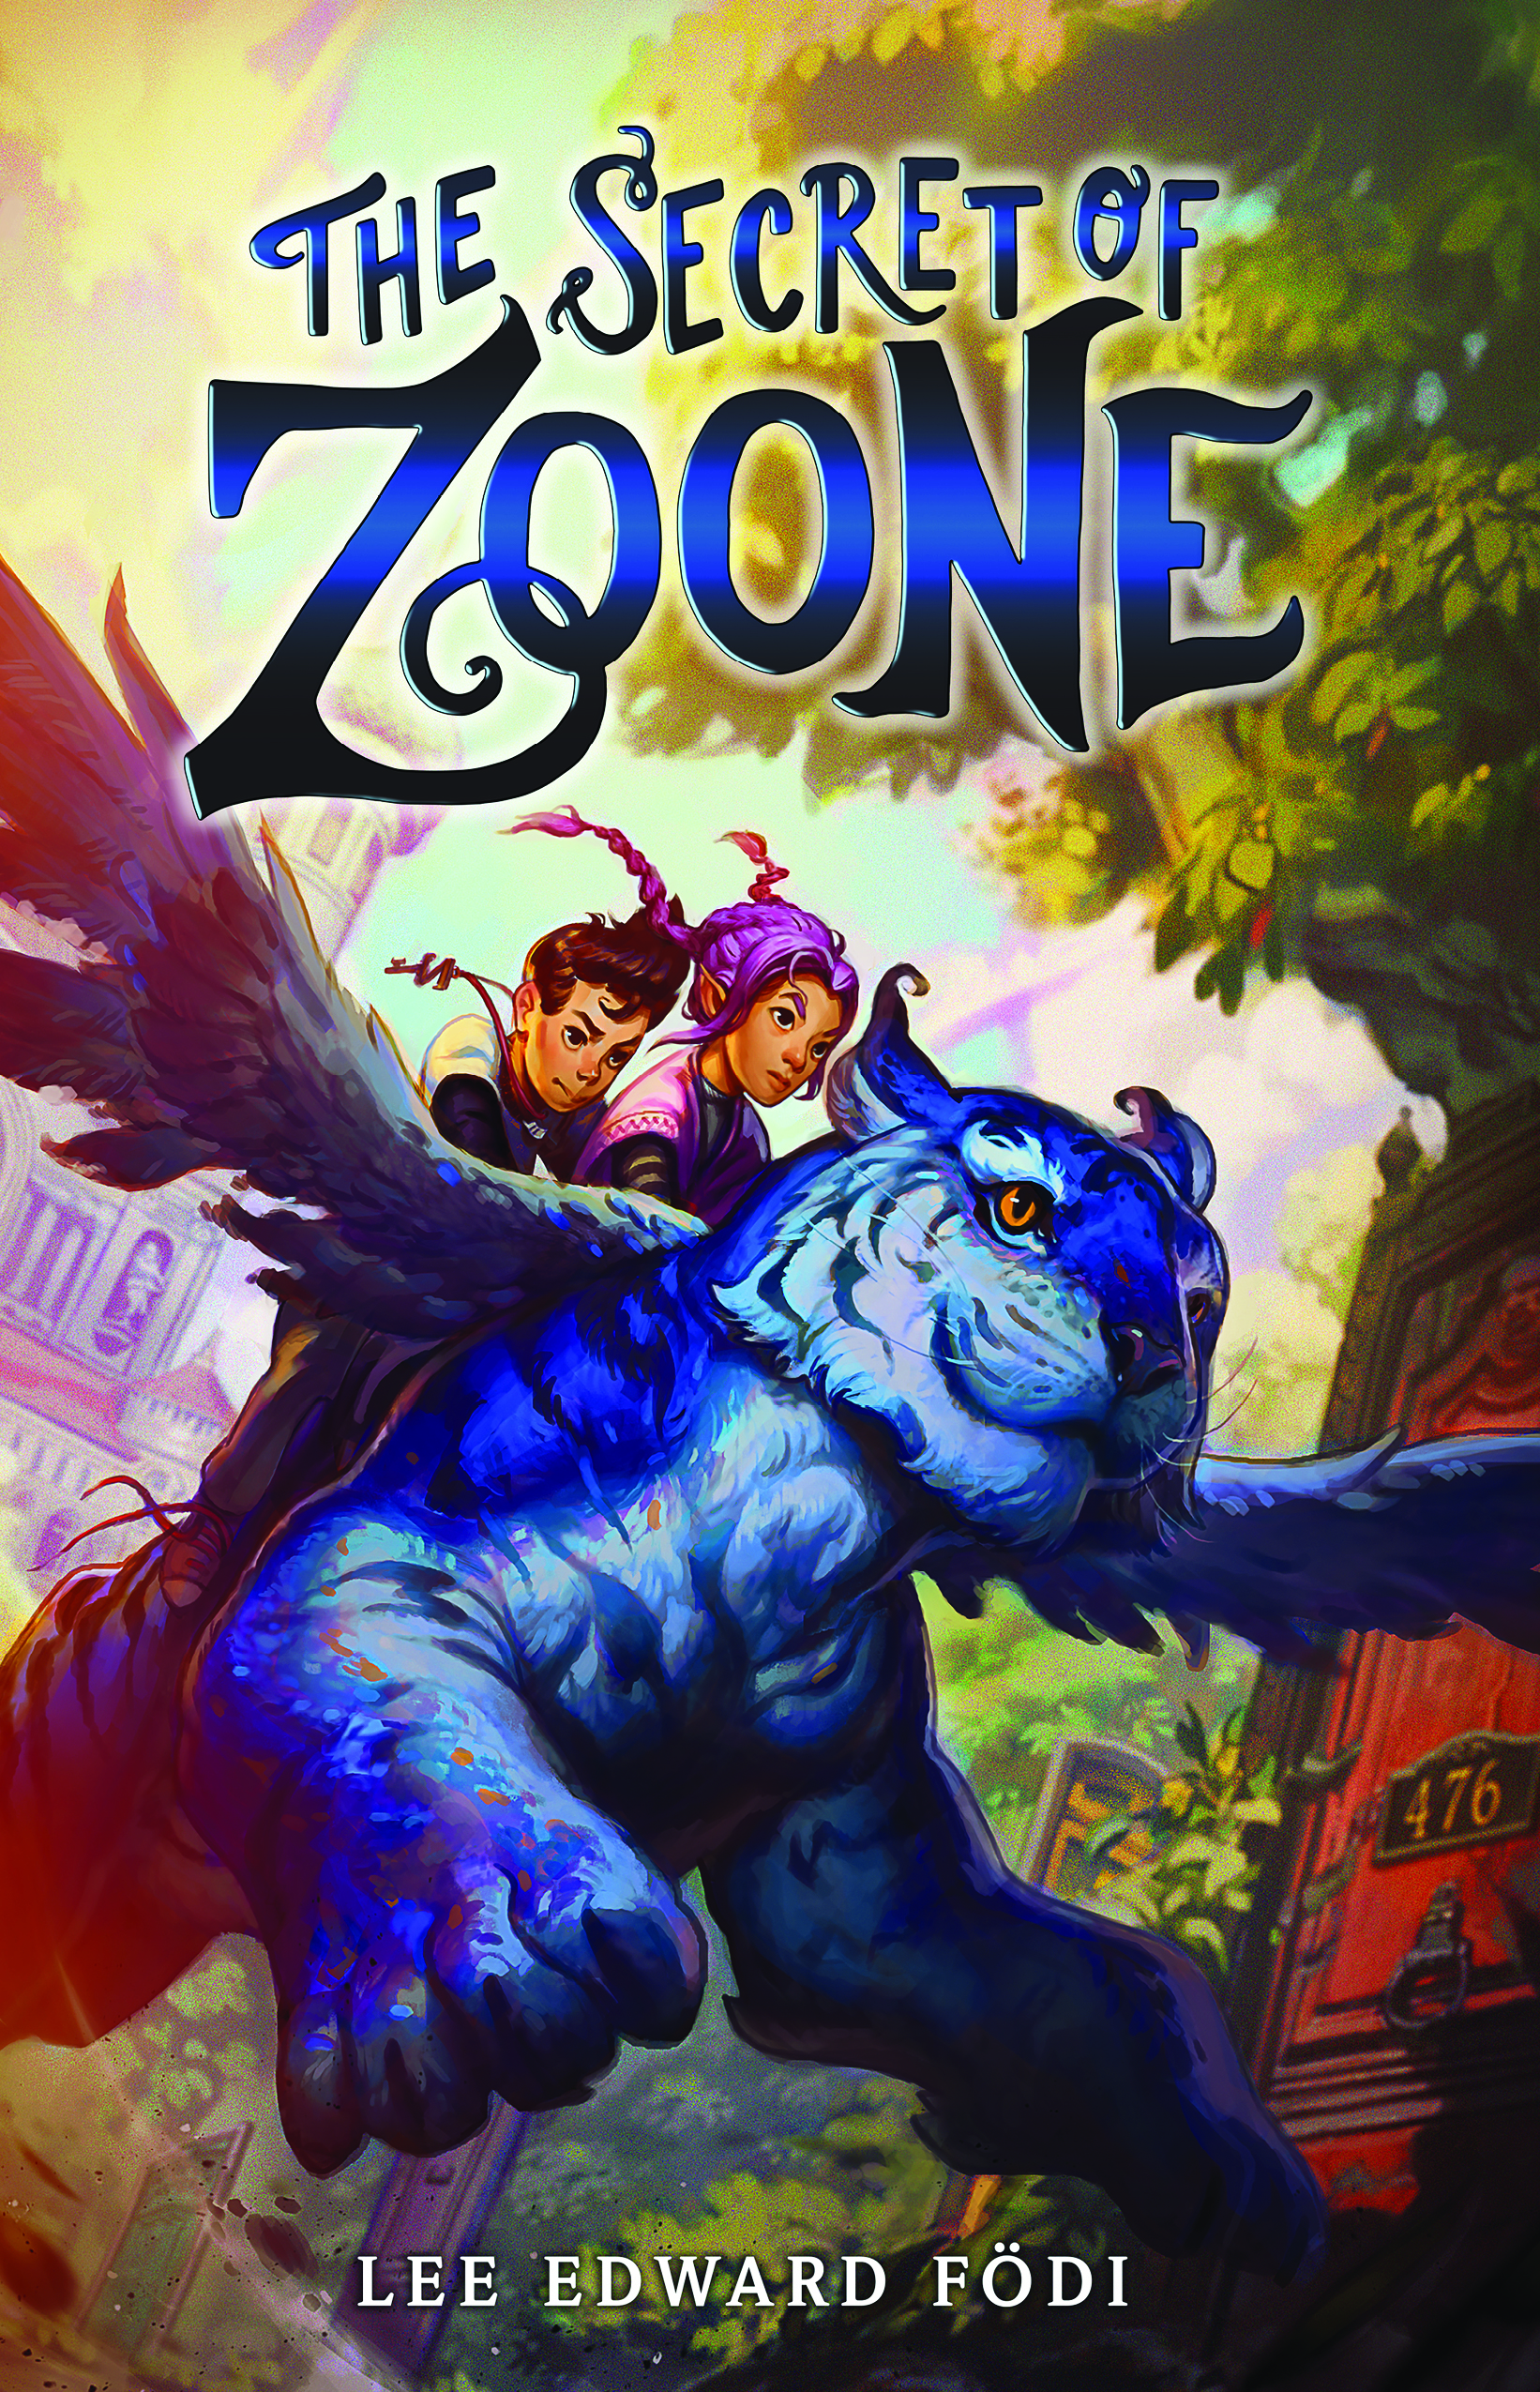 Fodi, Lee - The Secret of Zoone - Book 1 - FINAL COVER - June 6 2018.jpg